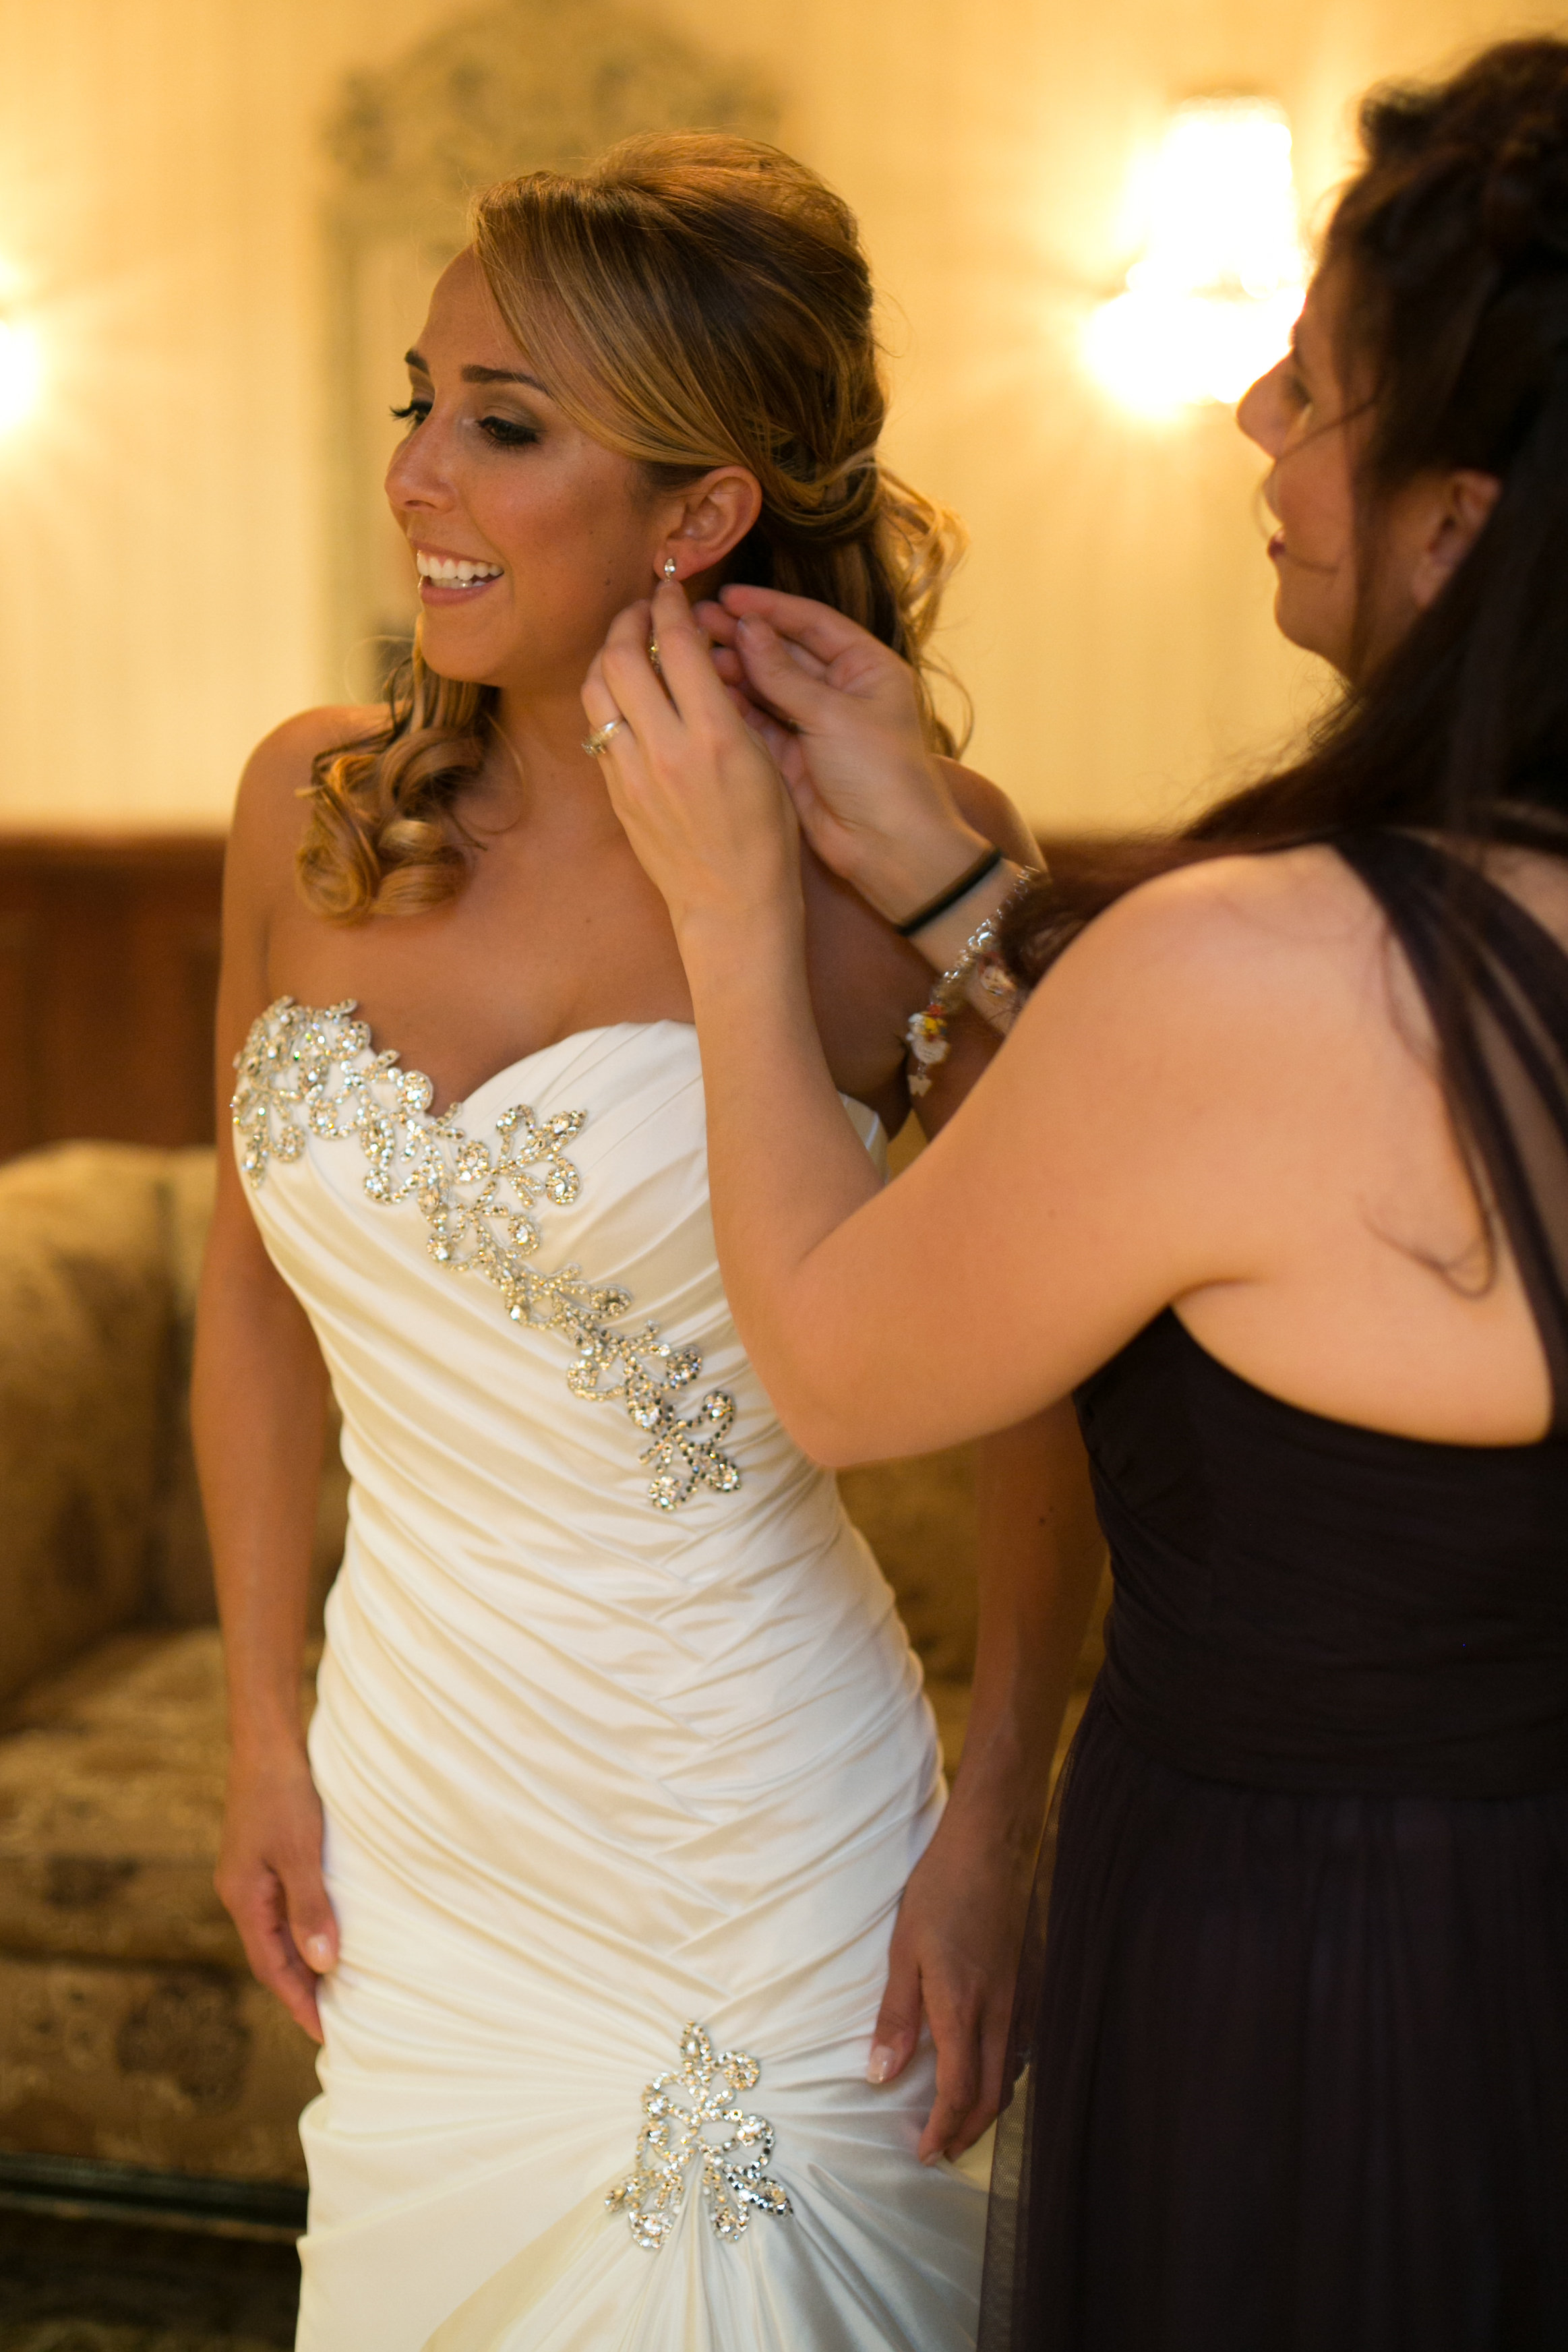 Ceci_New_York_Custom_Invitation_ New_Jersey_Wedding_Luxury_Personalized_Ceci_Style_Bride_Foil_Stamping13.jpg